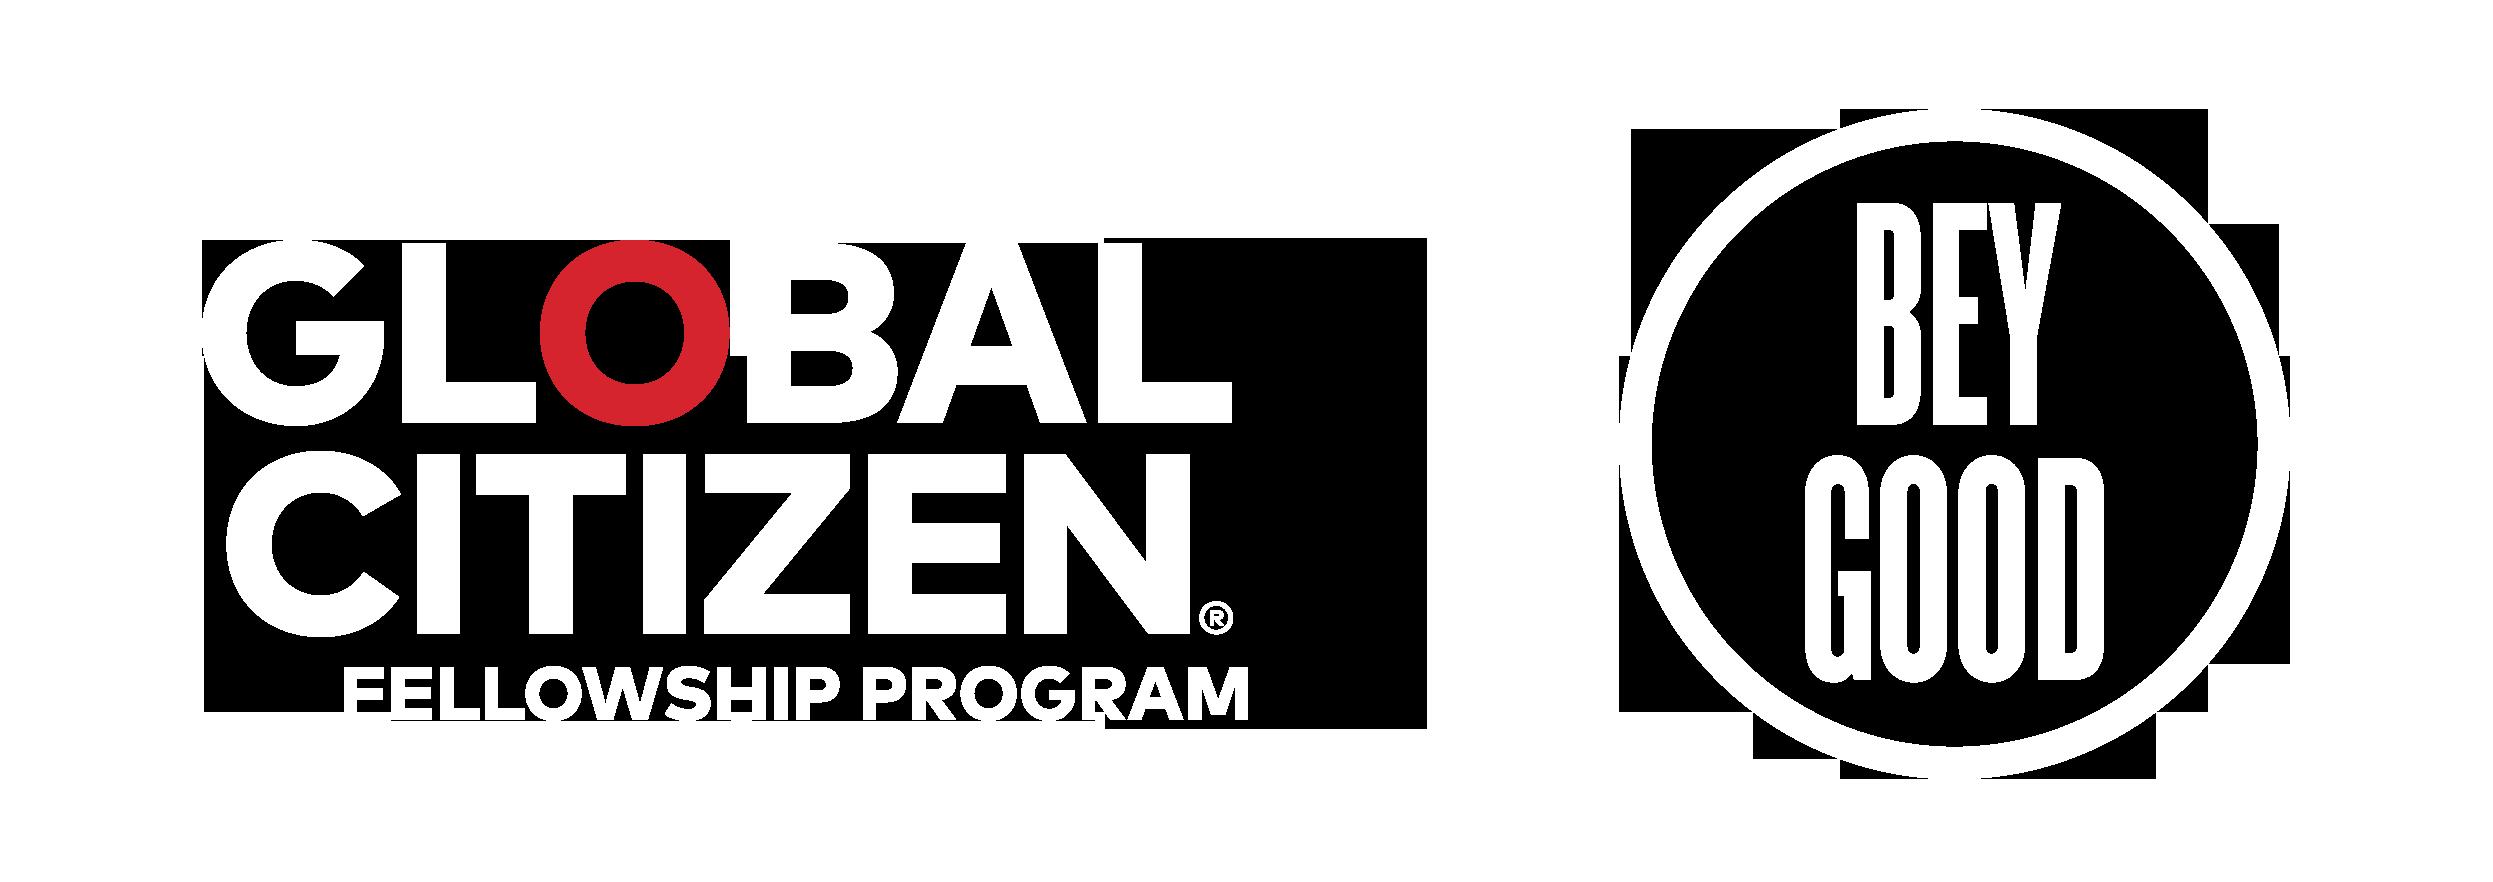 Global Citizen Fellowship Program powered by BeyGOOD.